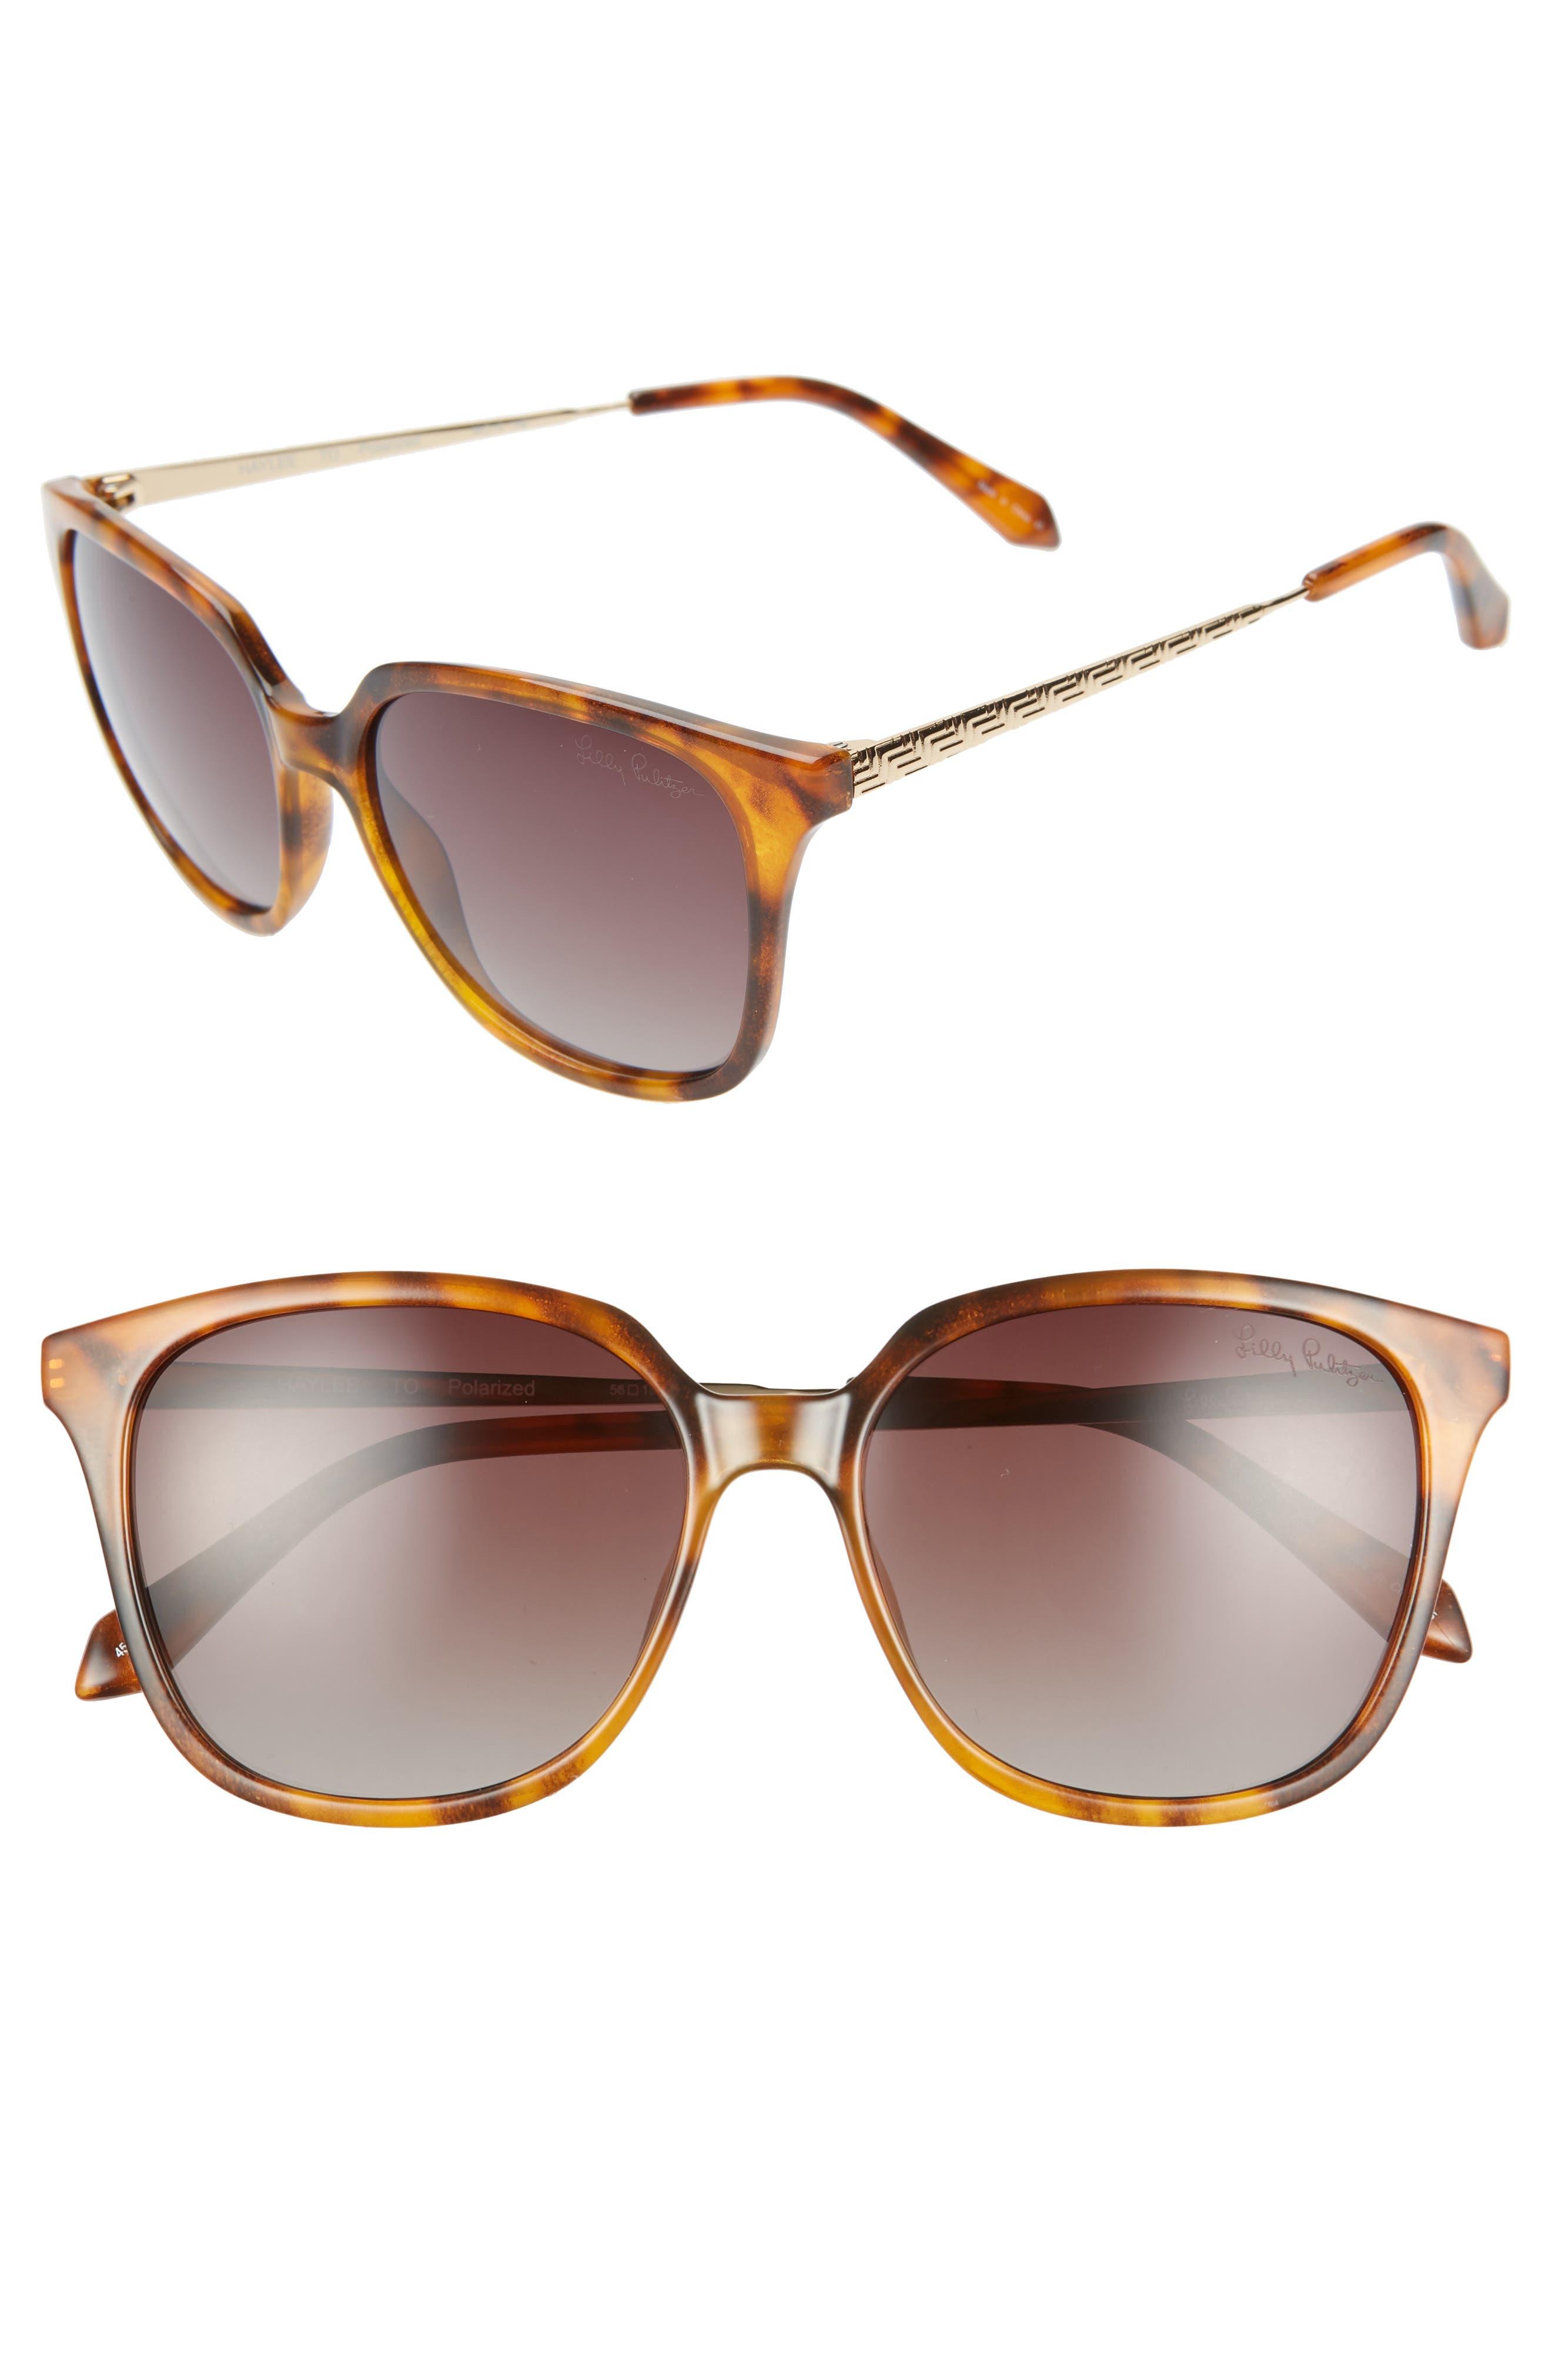 Lilly Pulitzer Haylee 5m Sunglasses - Caramel Tortoise/ Brown